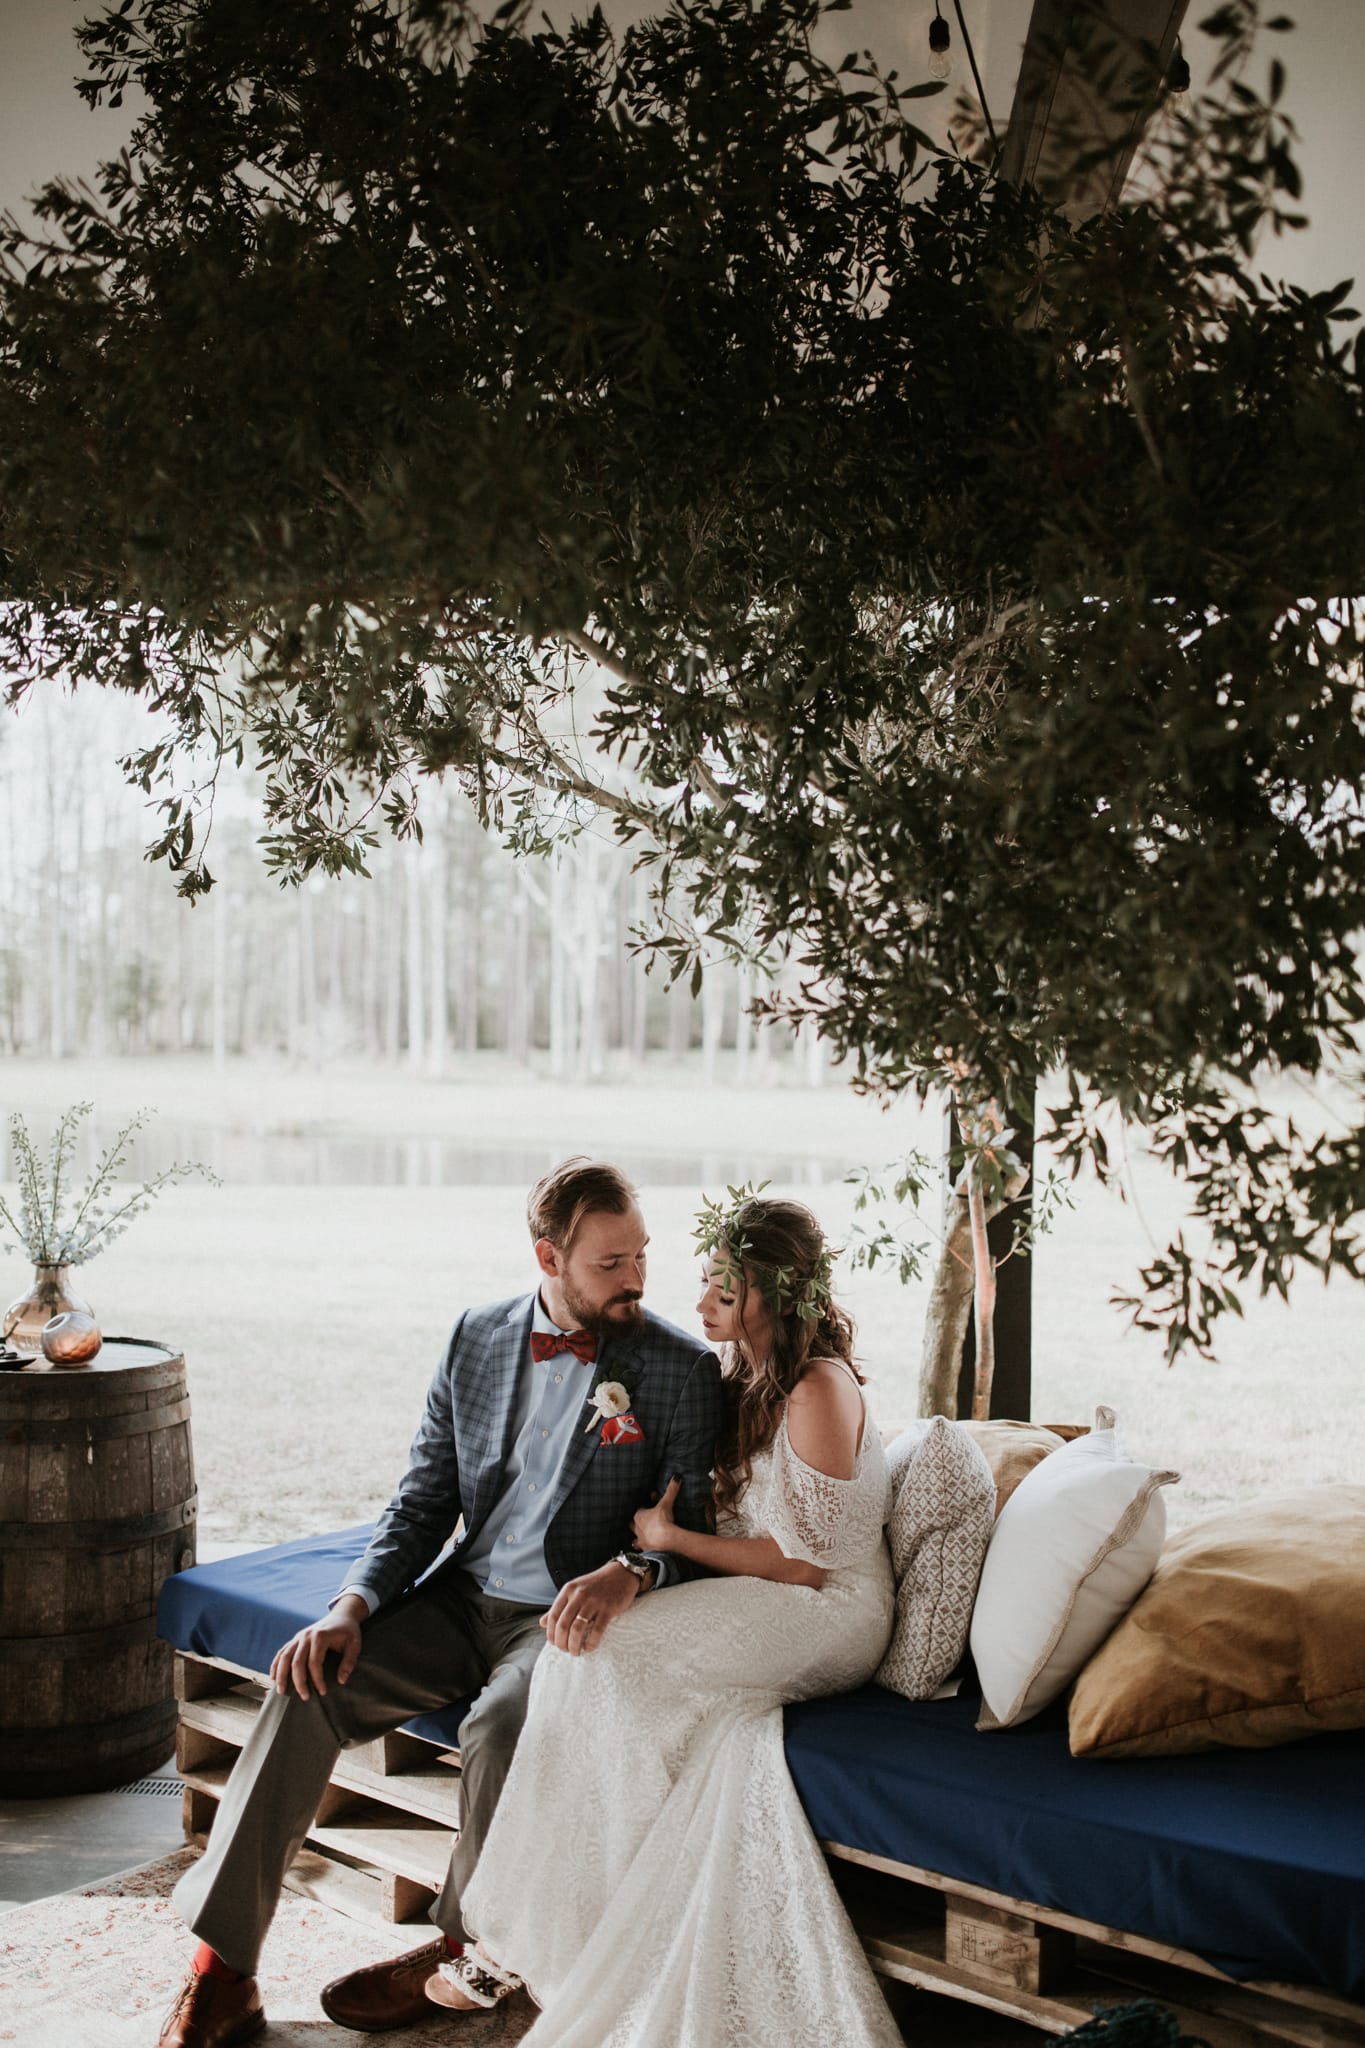 Wilmington-nc-wedding-photographer-Barn-at-Rock-creek.jpg